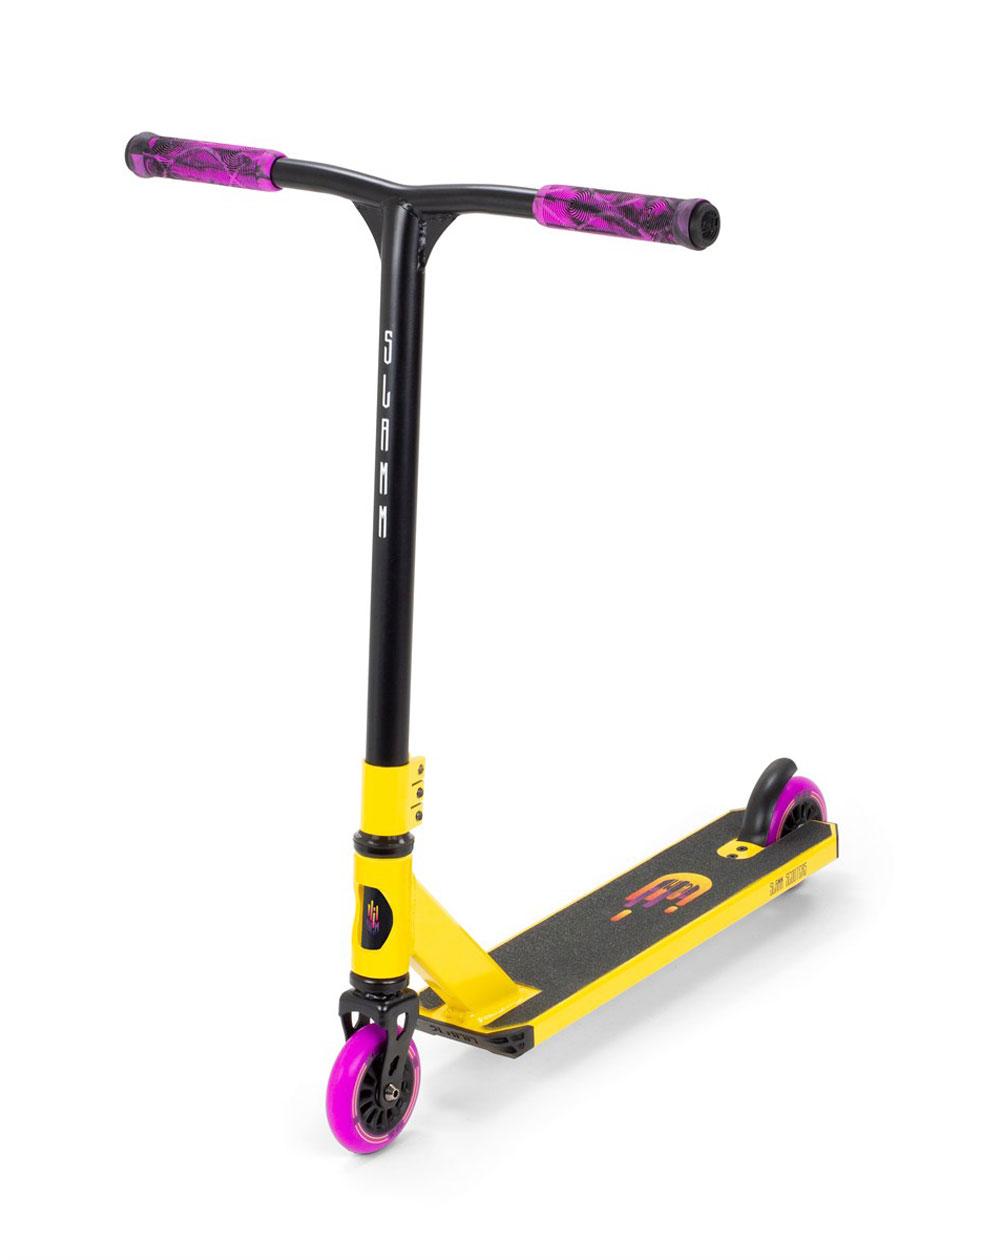 Slamm Scooters Monopattino Freestyle Tantrum V9 Yellow